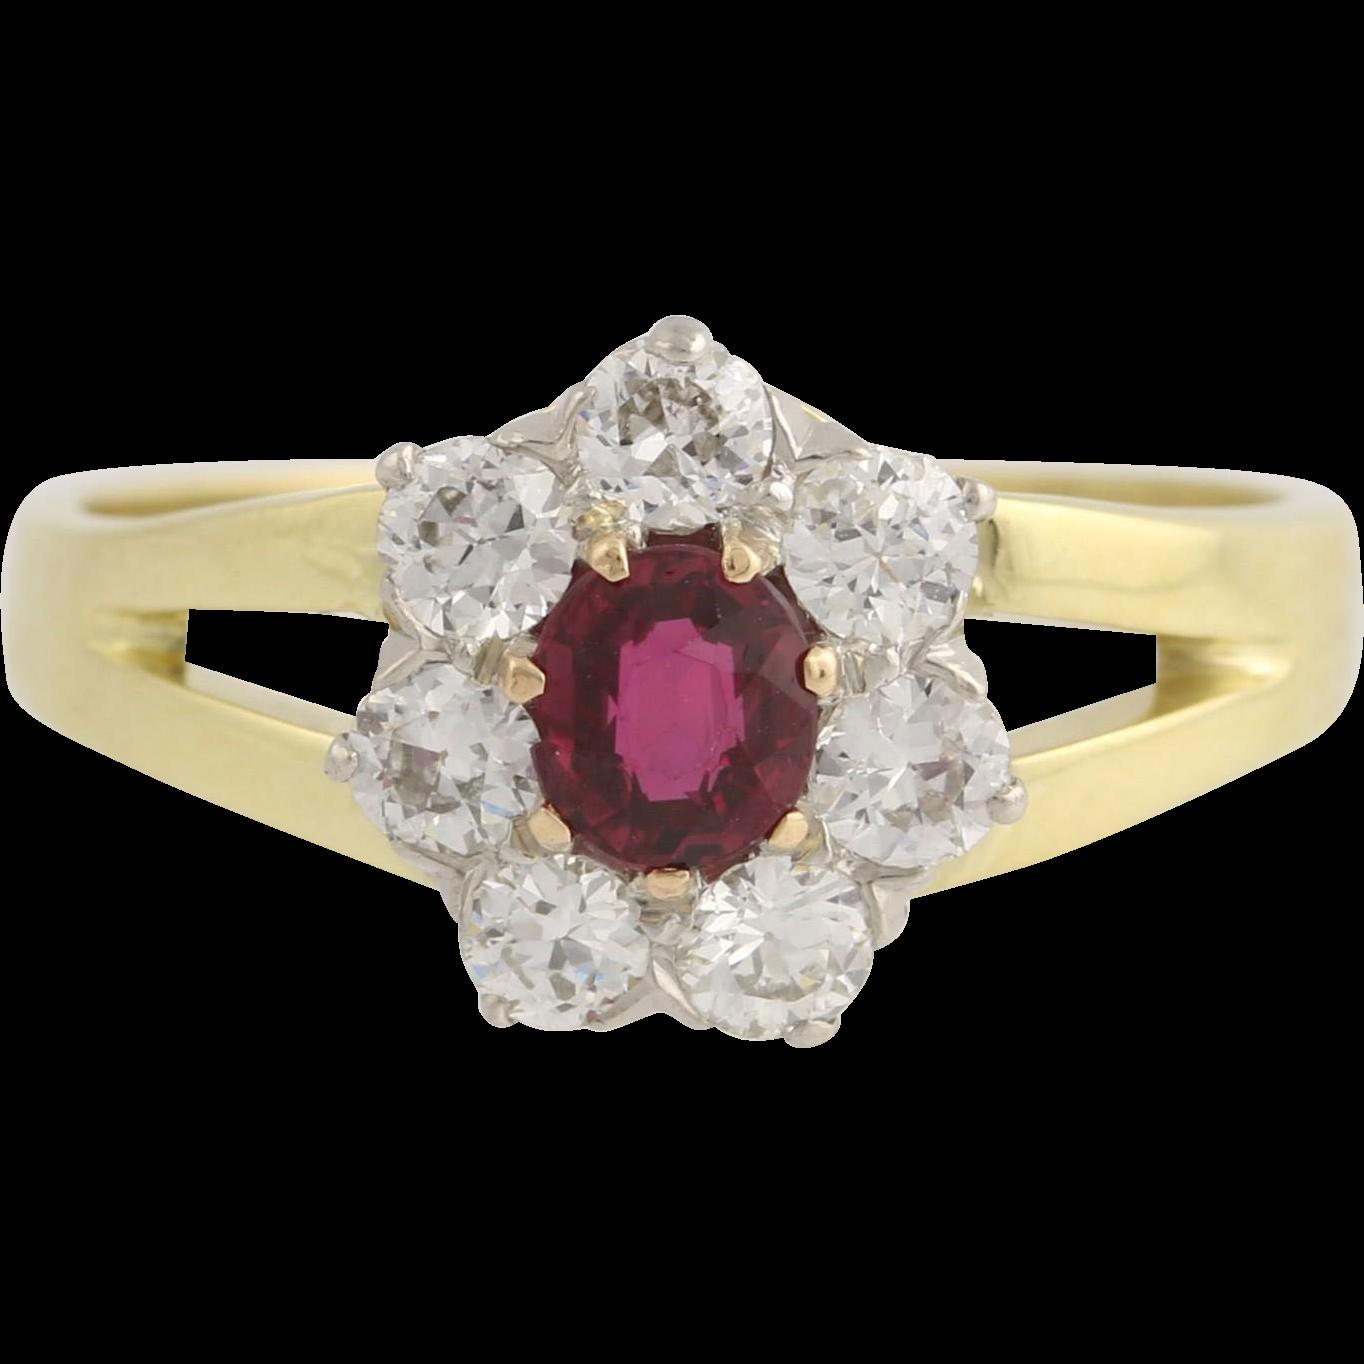 Ruby & Diamond Ring - 18k Yellow Gold and Platinum July Birthstone Genuine 1.15ctw